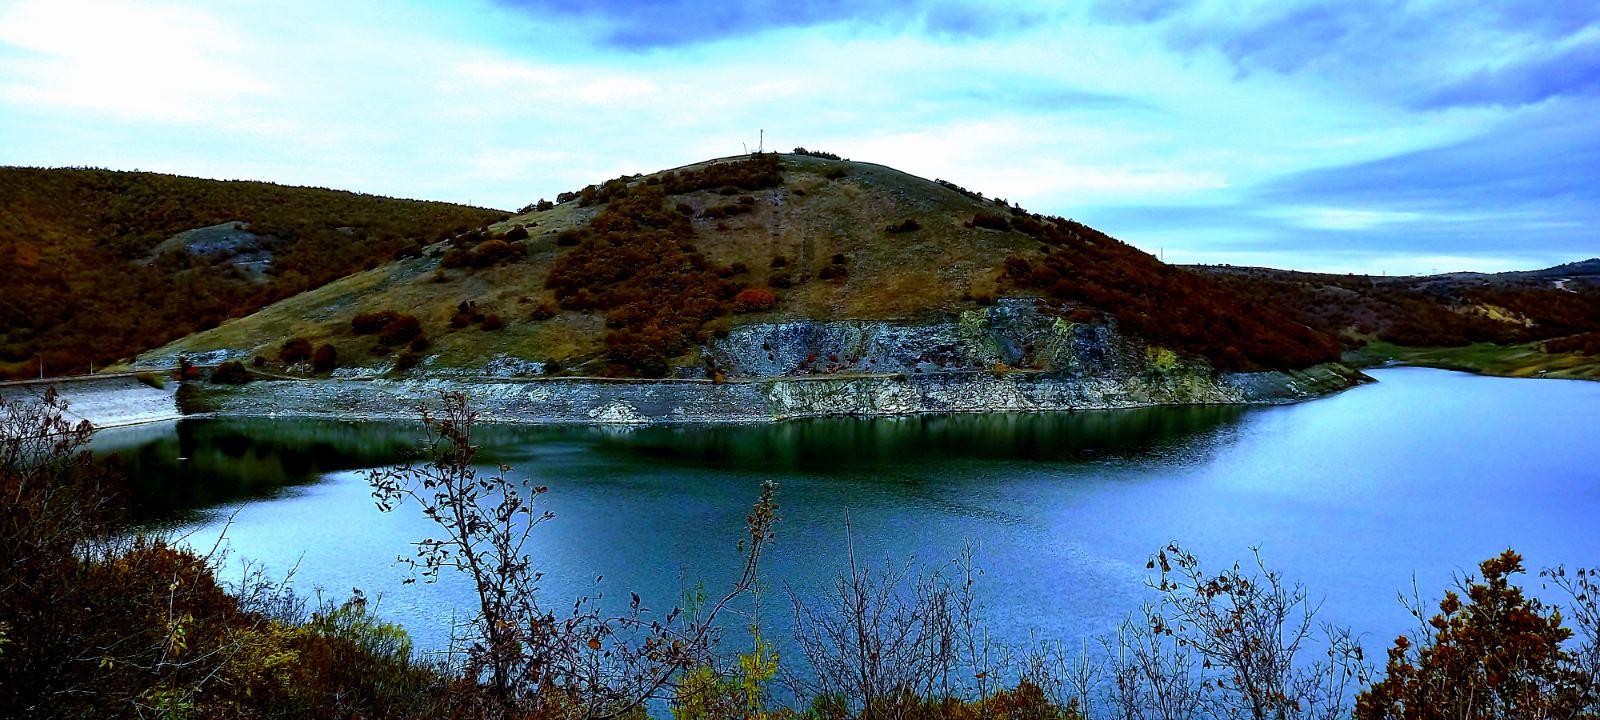 Badovci lake kosovo balkandestination 2